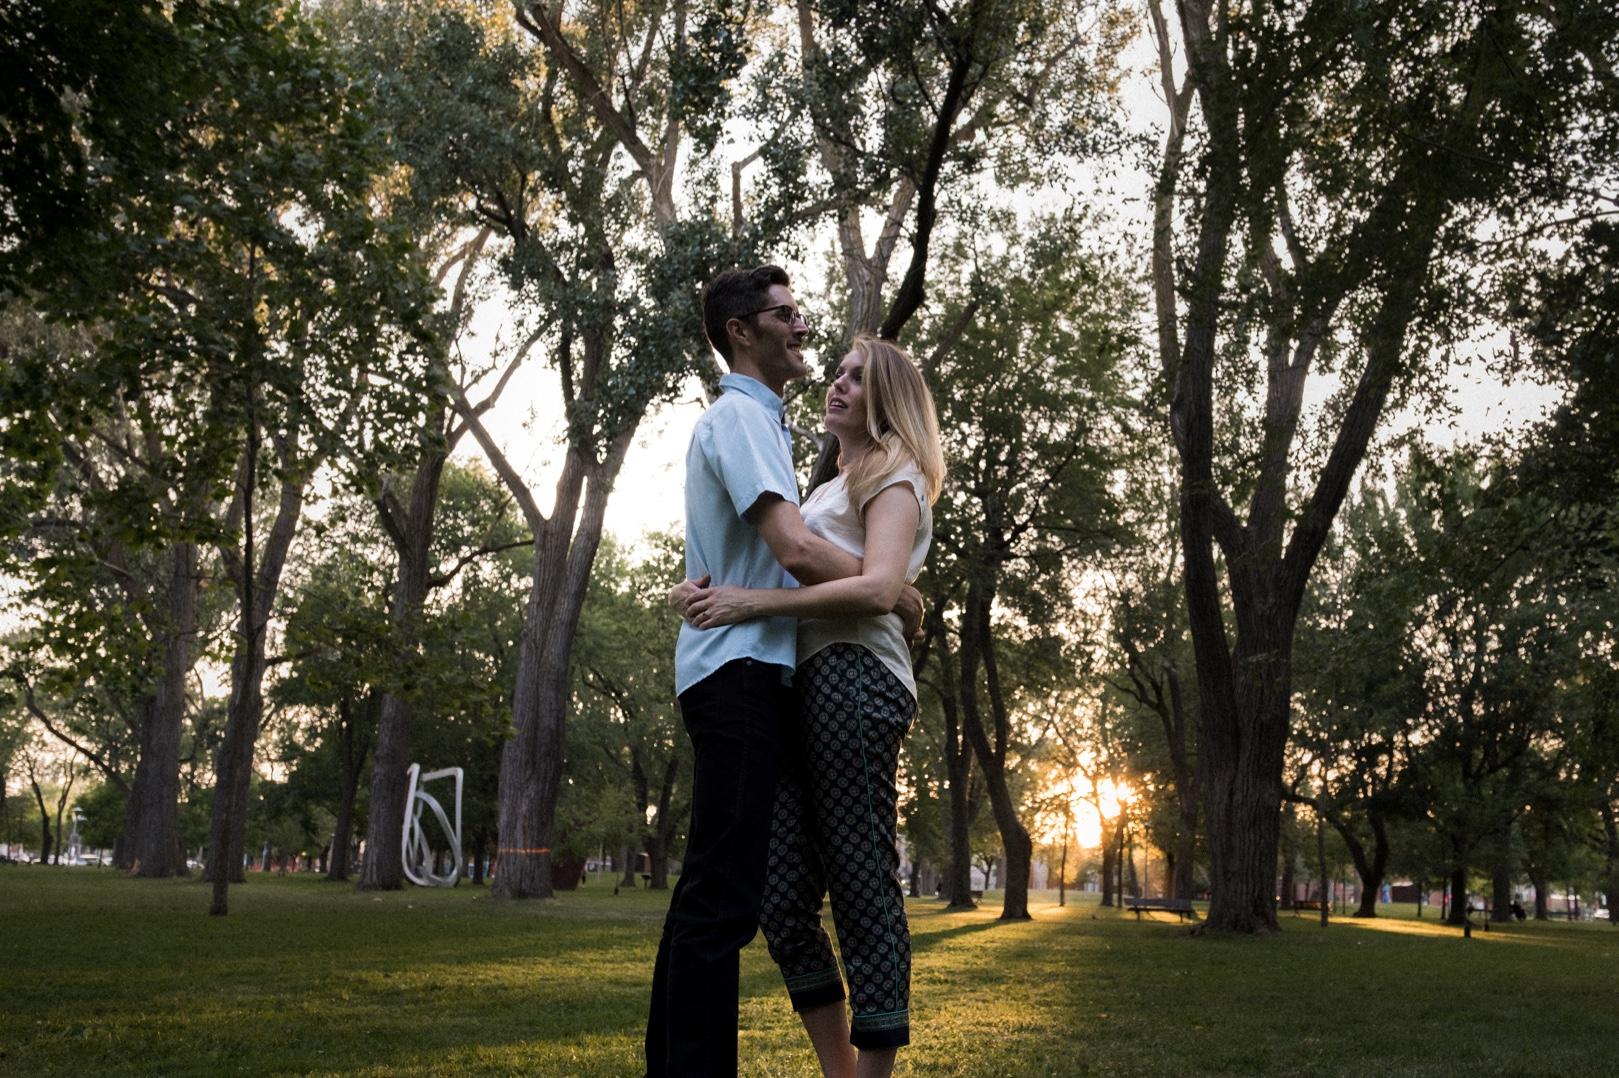 13_ELIZ AND ALEX-687_Events_Weddings_2018_Travel_Engagement_Photography_best_Portraits.jpg